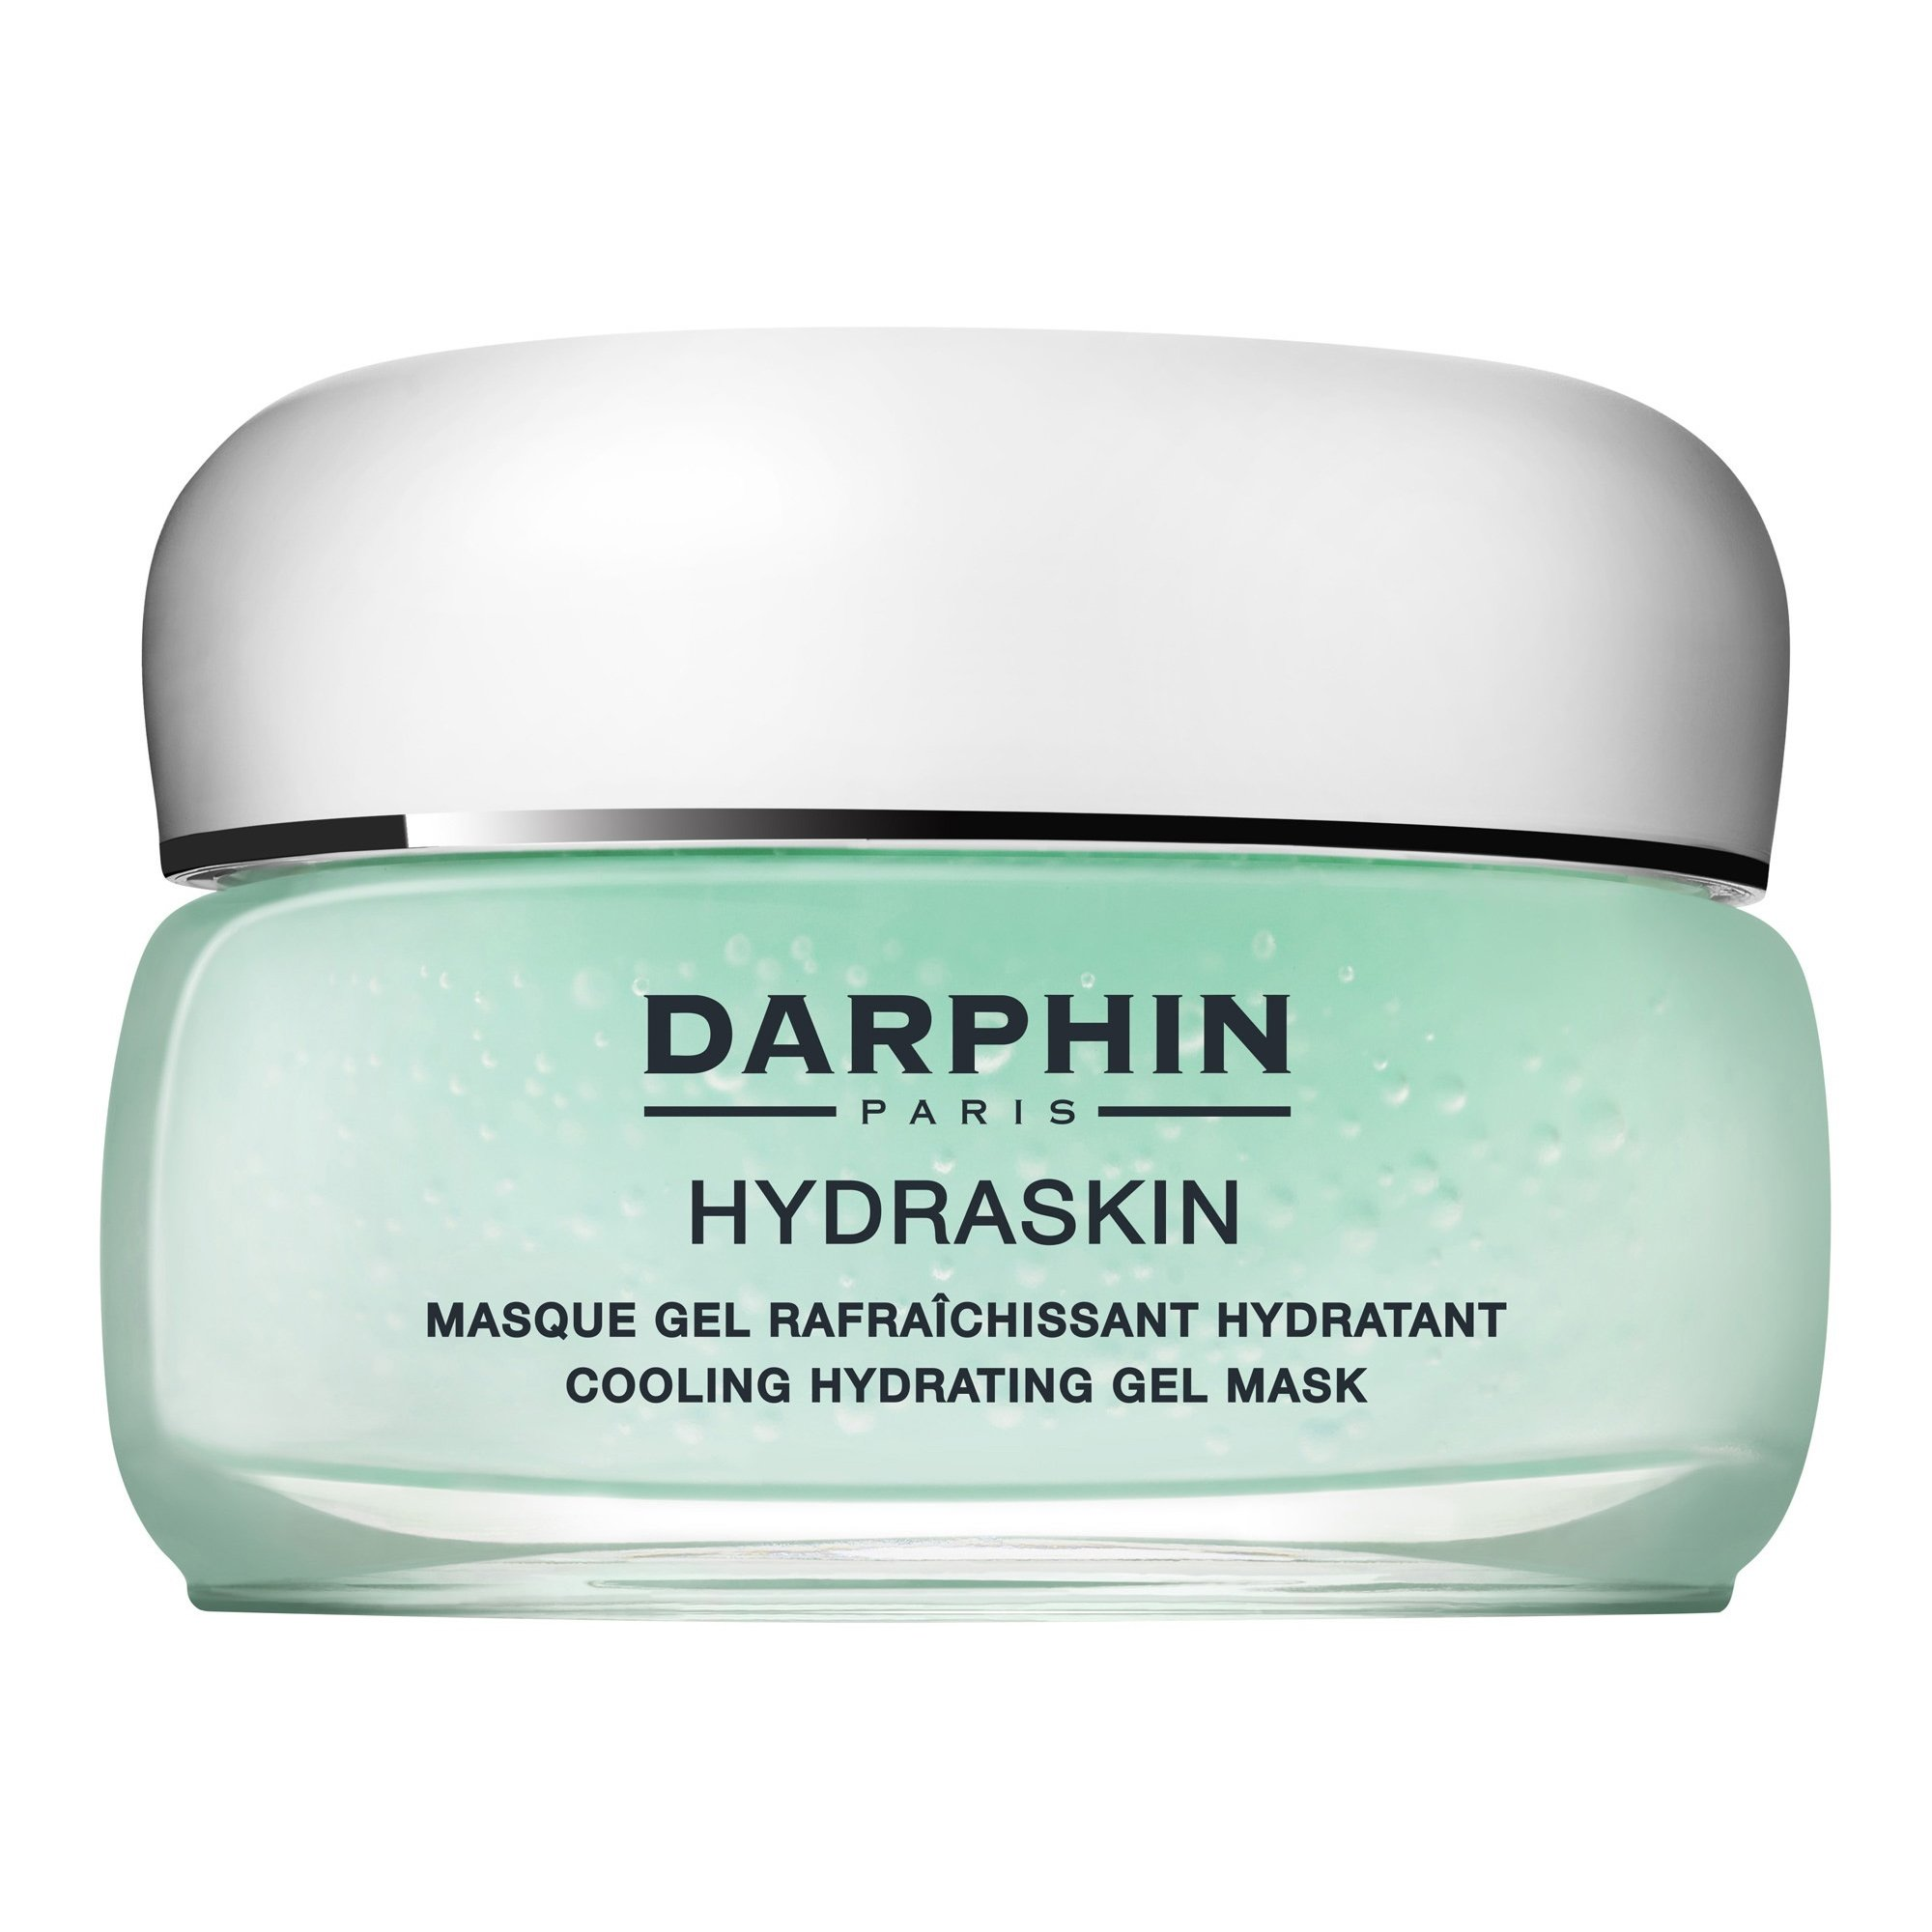 Darphin Hydraskin Cooling Hydrating Gel Mask Δροσερή Μάσκα Επαναφοράς των Επιπέδων Υγρασίας του Δέρματος 24ωρης Ενυδάτωσης 50ml